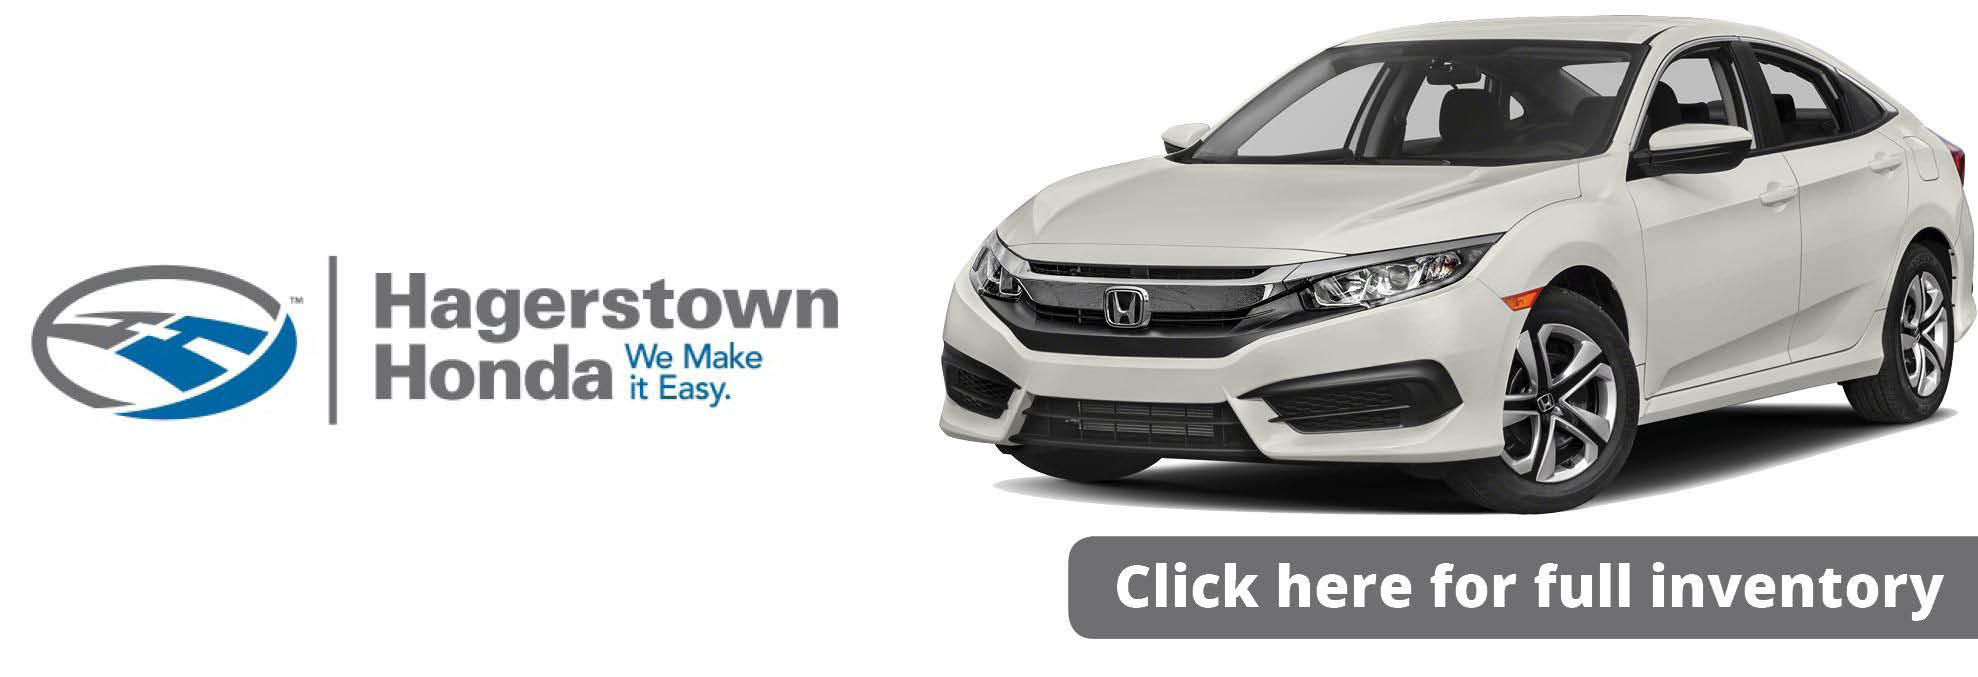 Hagerstown Honda, Honda, coupon, Sales, Car Sales, Buy Cars, New Car